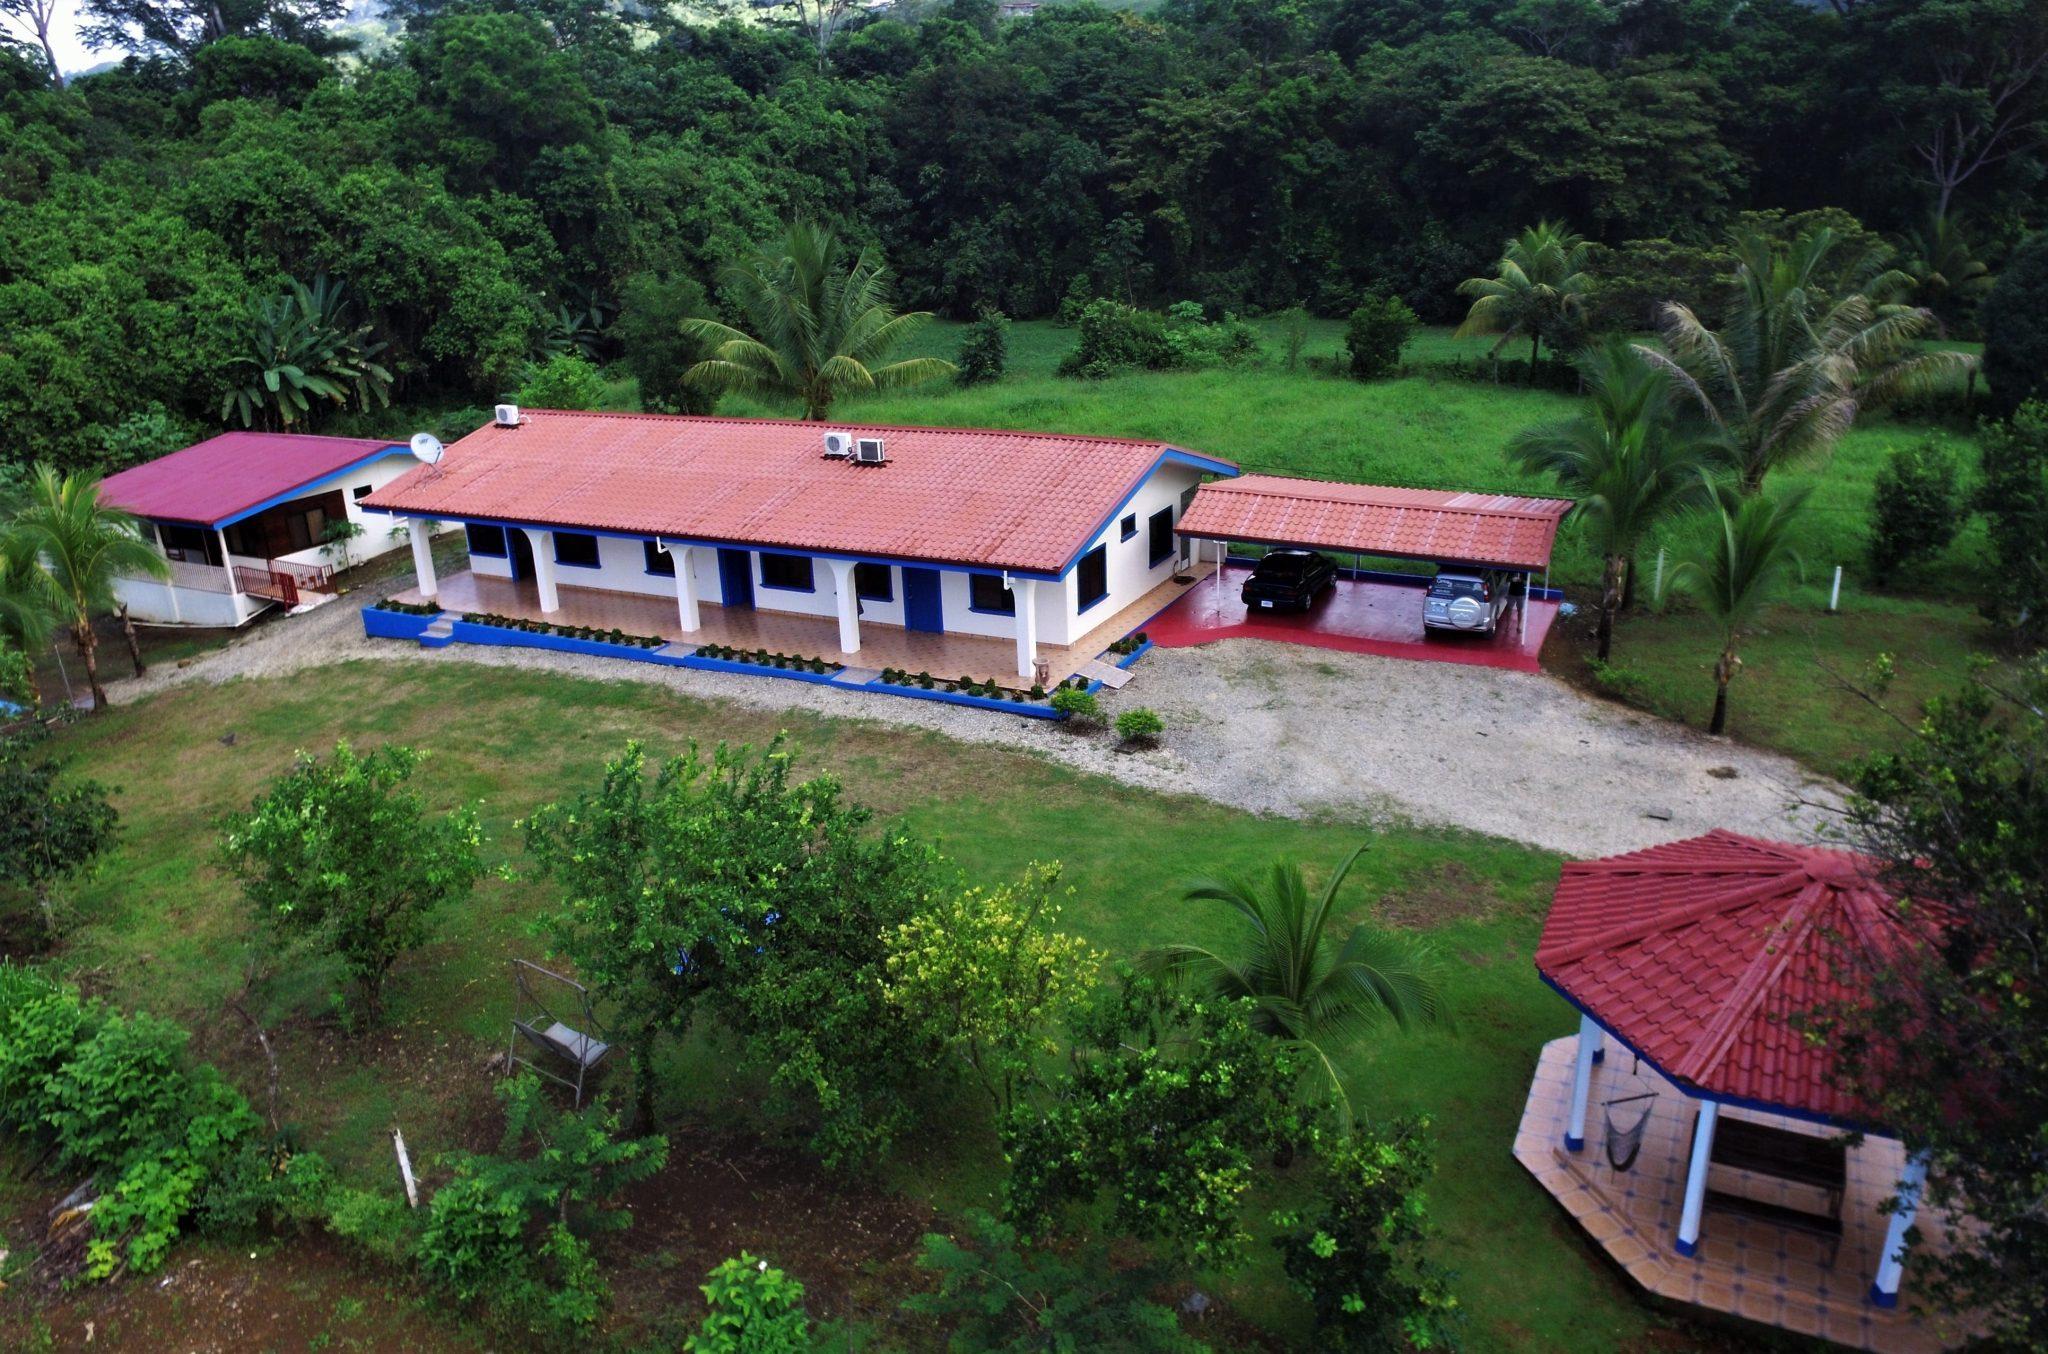 0.63 ACRES - 2 Bedroom Home Plus Three 2 Bedroom Rental Villas!!!